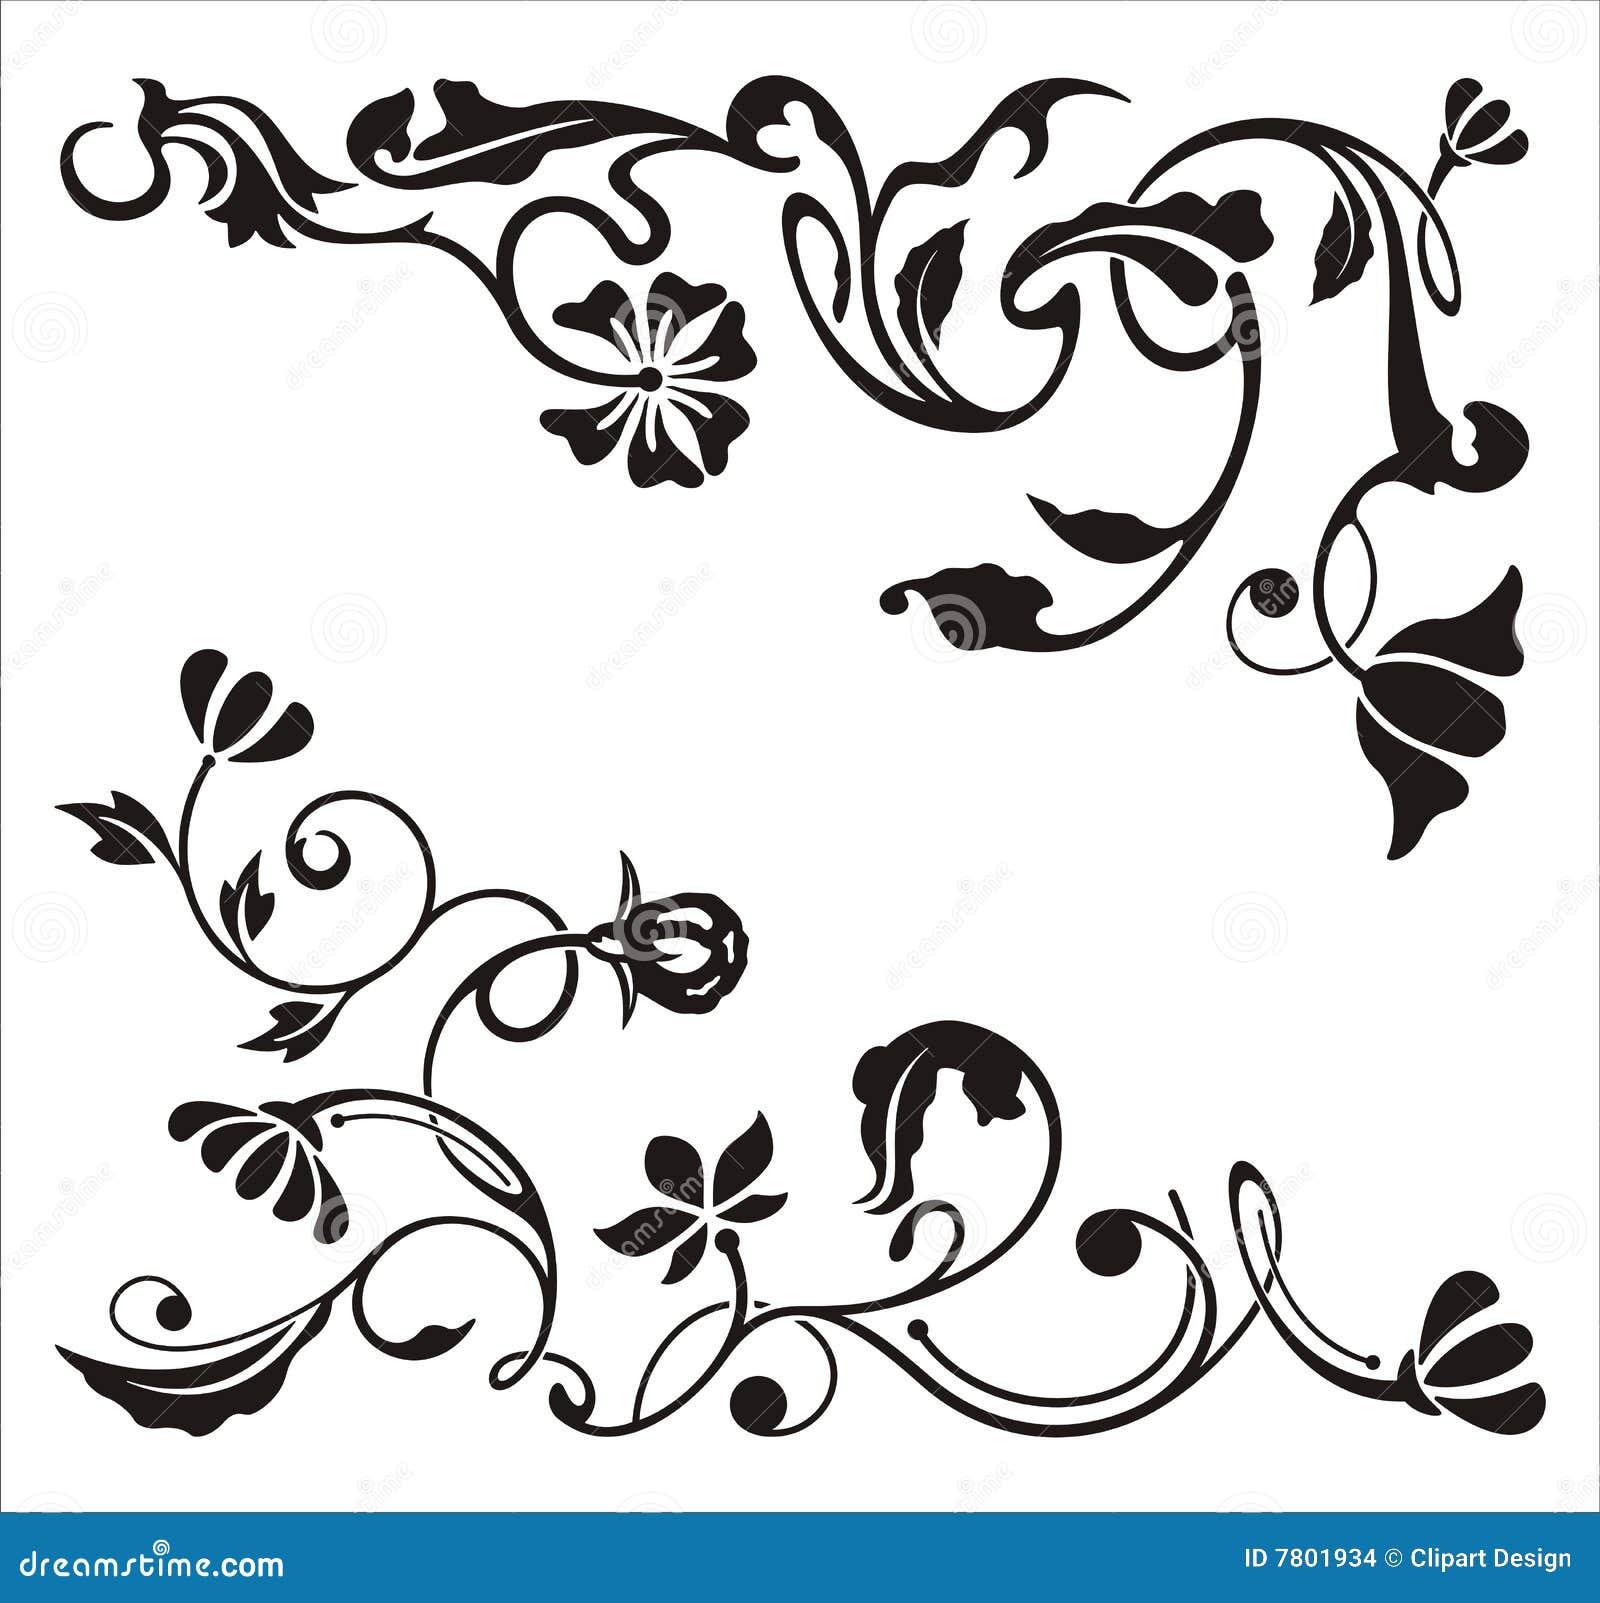 Ornamental Corner Designs Stock Images - Image: 7801934